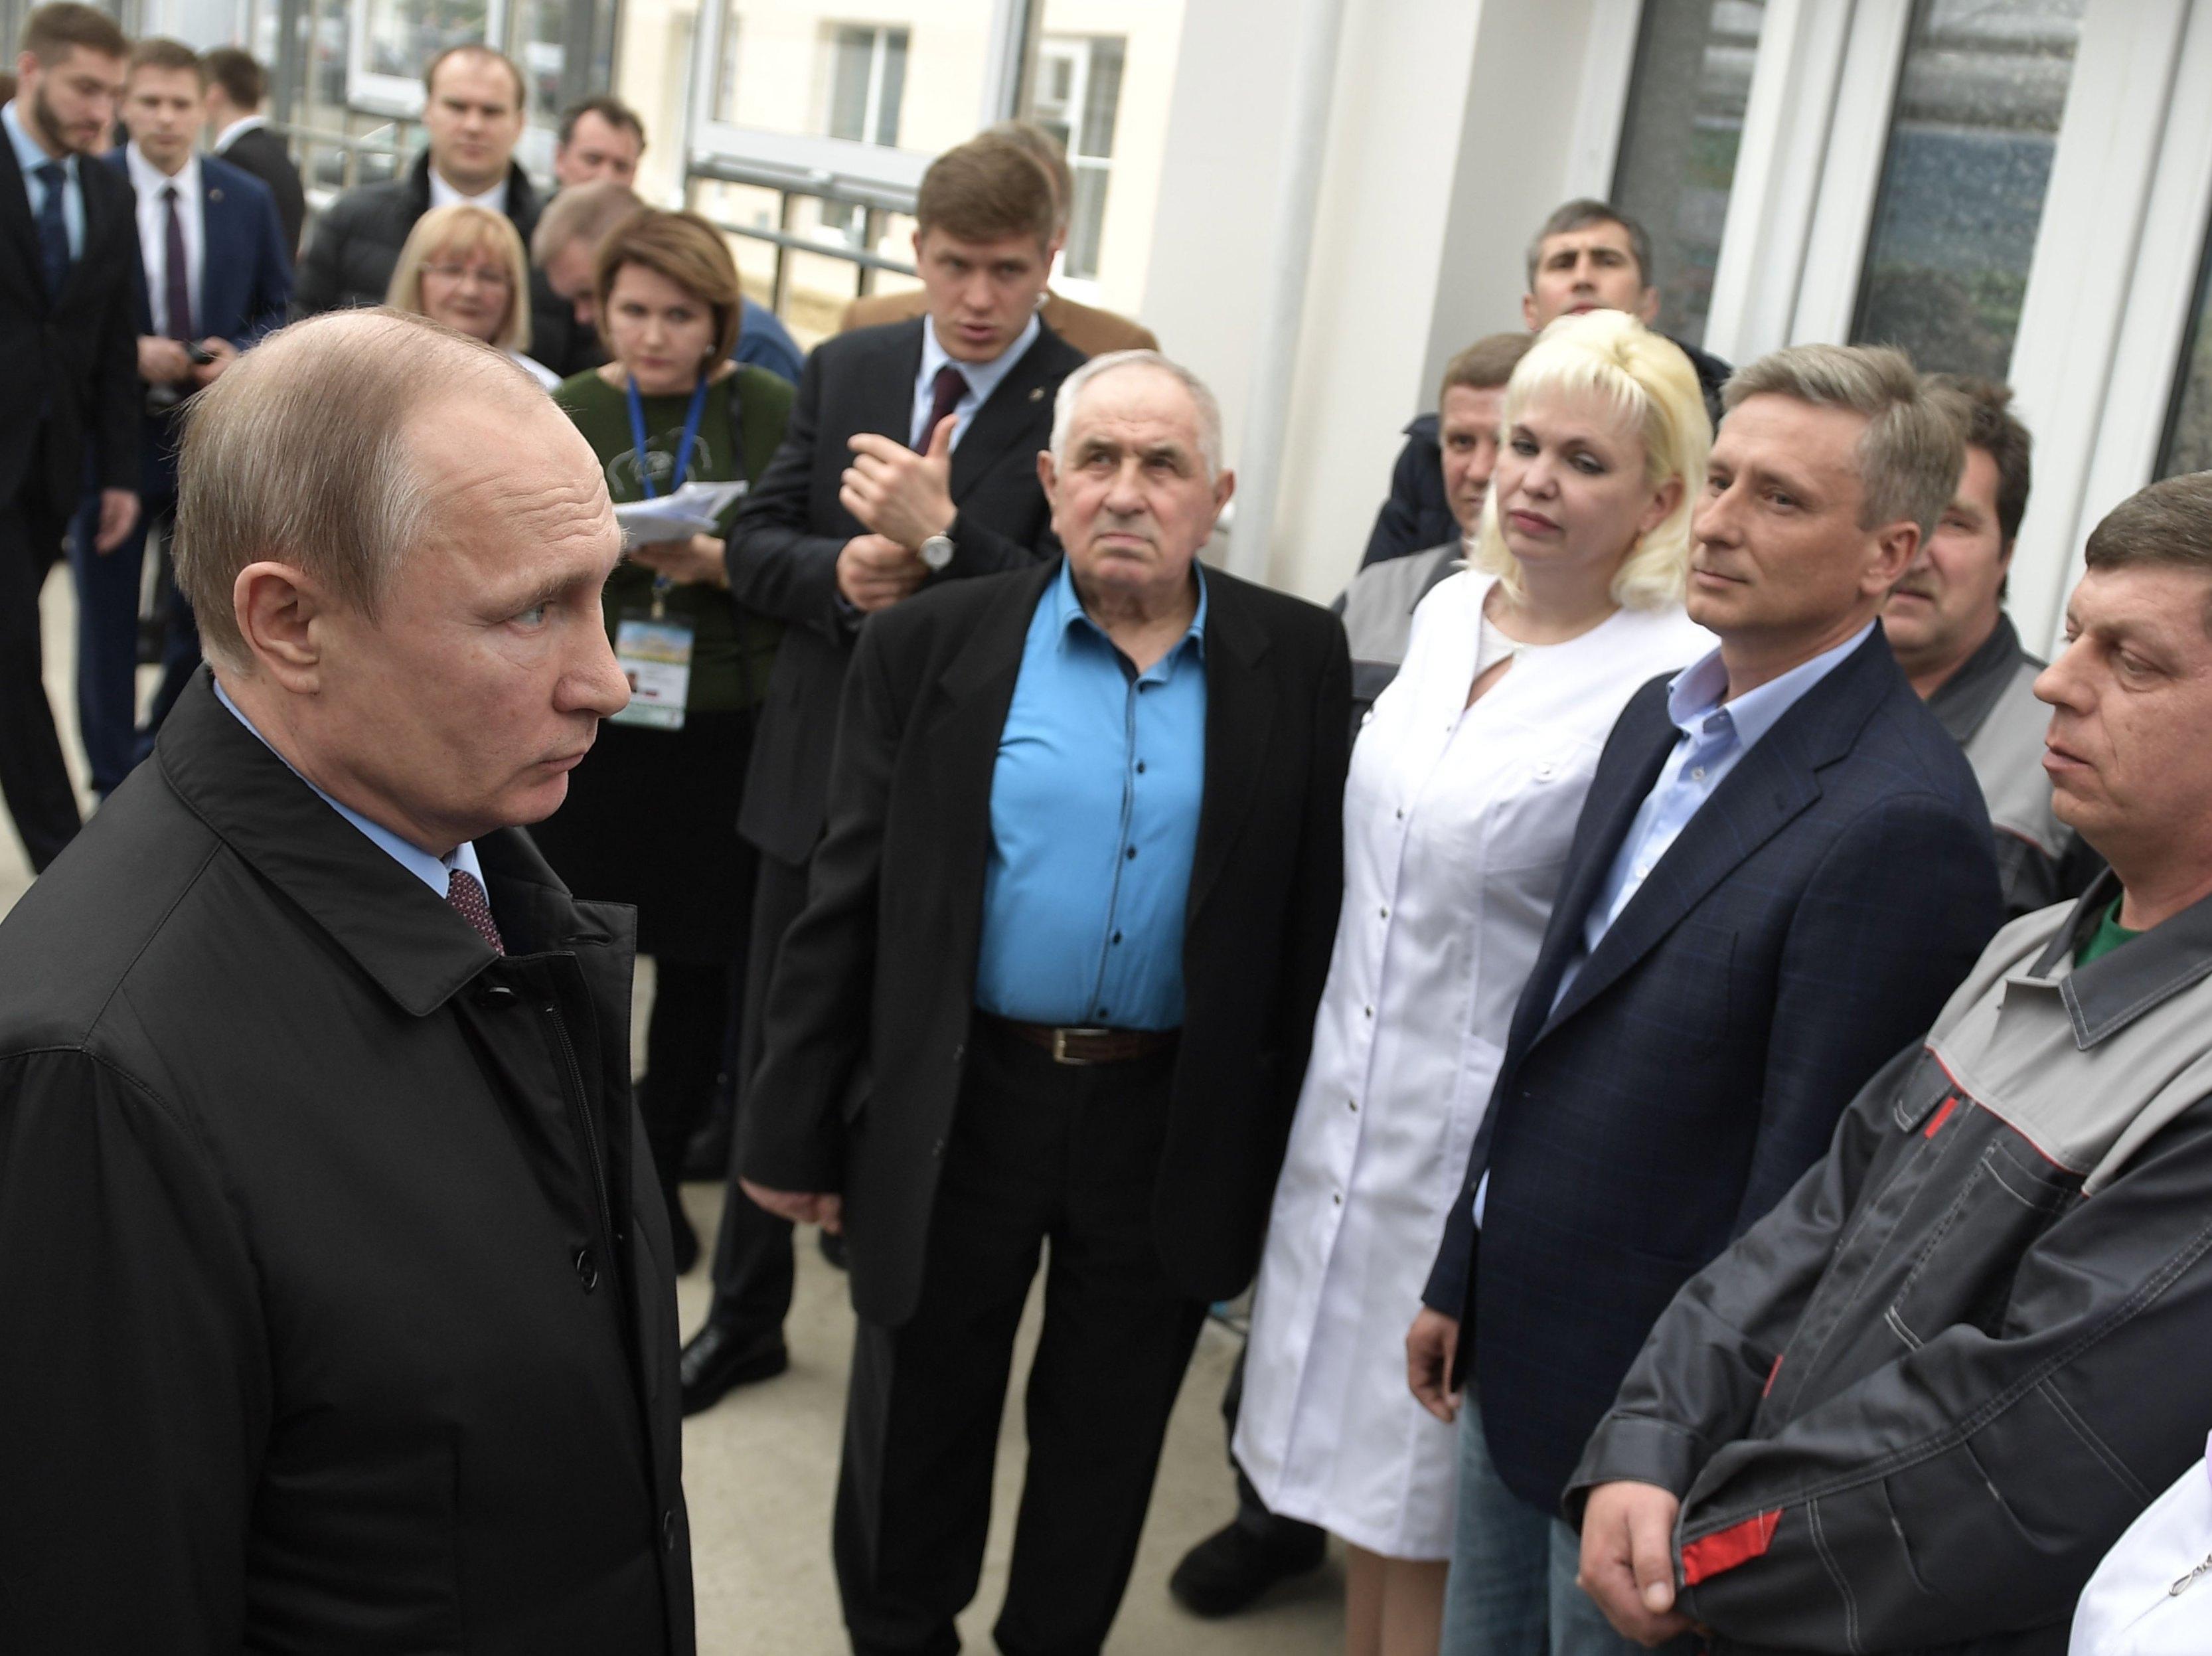 Londres ameaça boicotar Mundial e cortar sinal à Russia Today